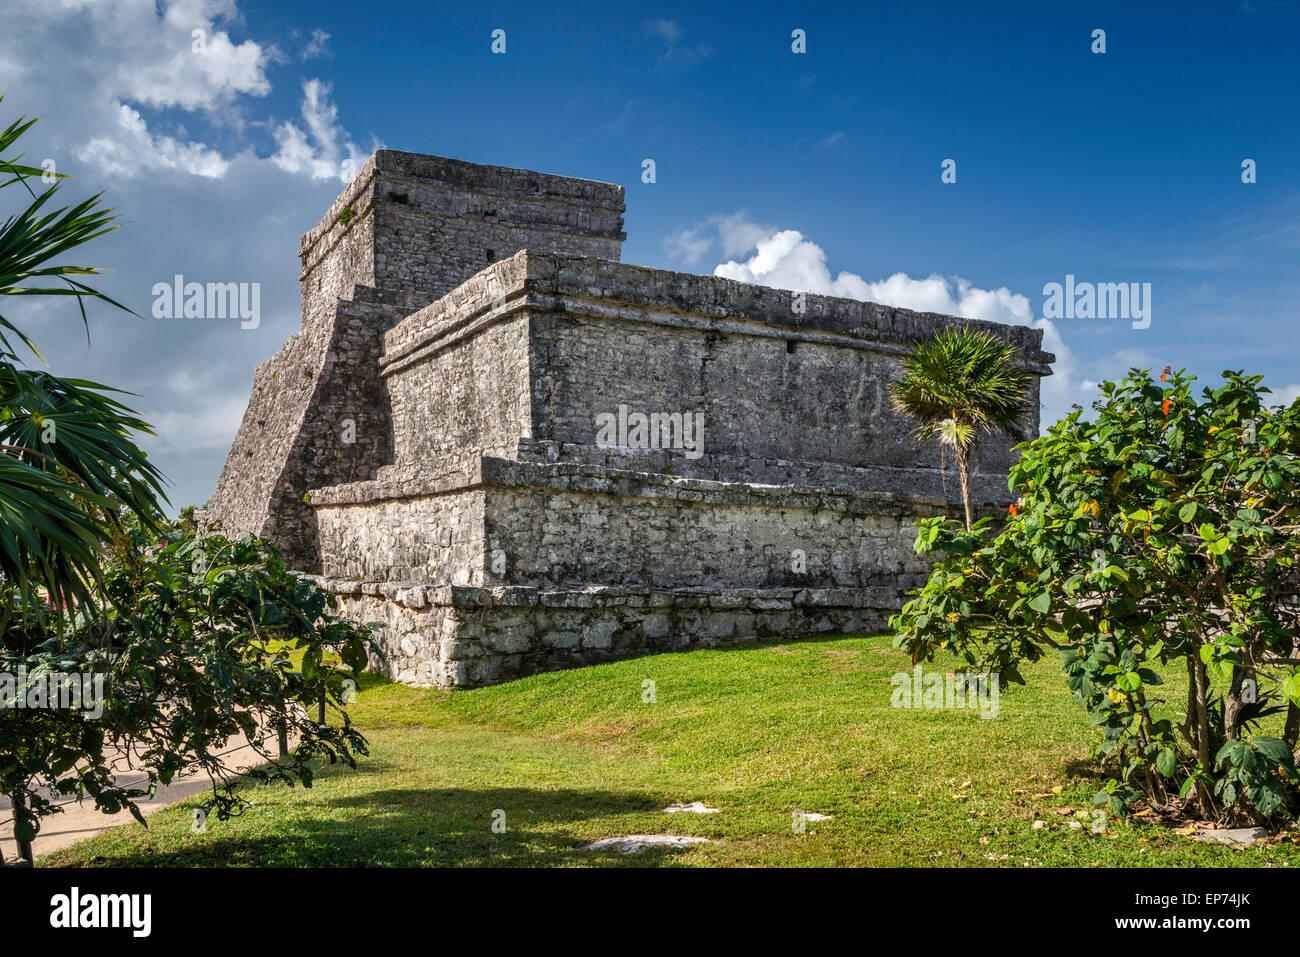 El Castillo (The Castle), Maya ruins at Tulum, Yucatan Peninsula, Quintana Roo state, Mexico - Stock Image